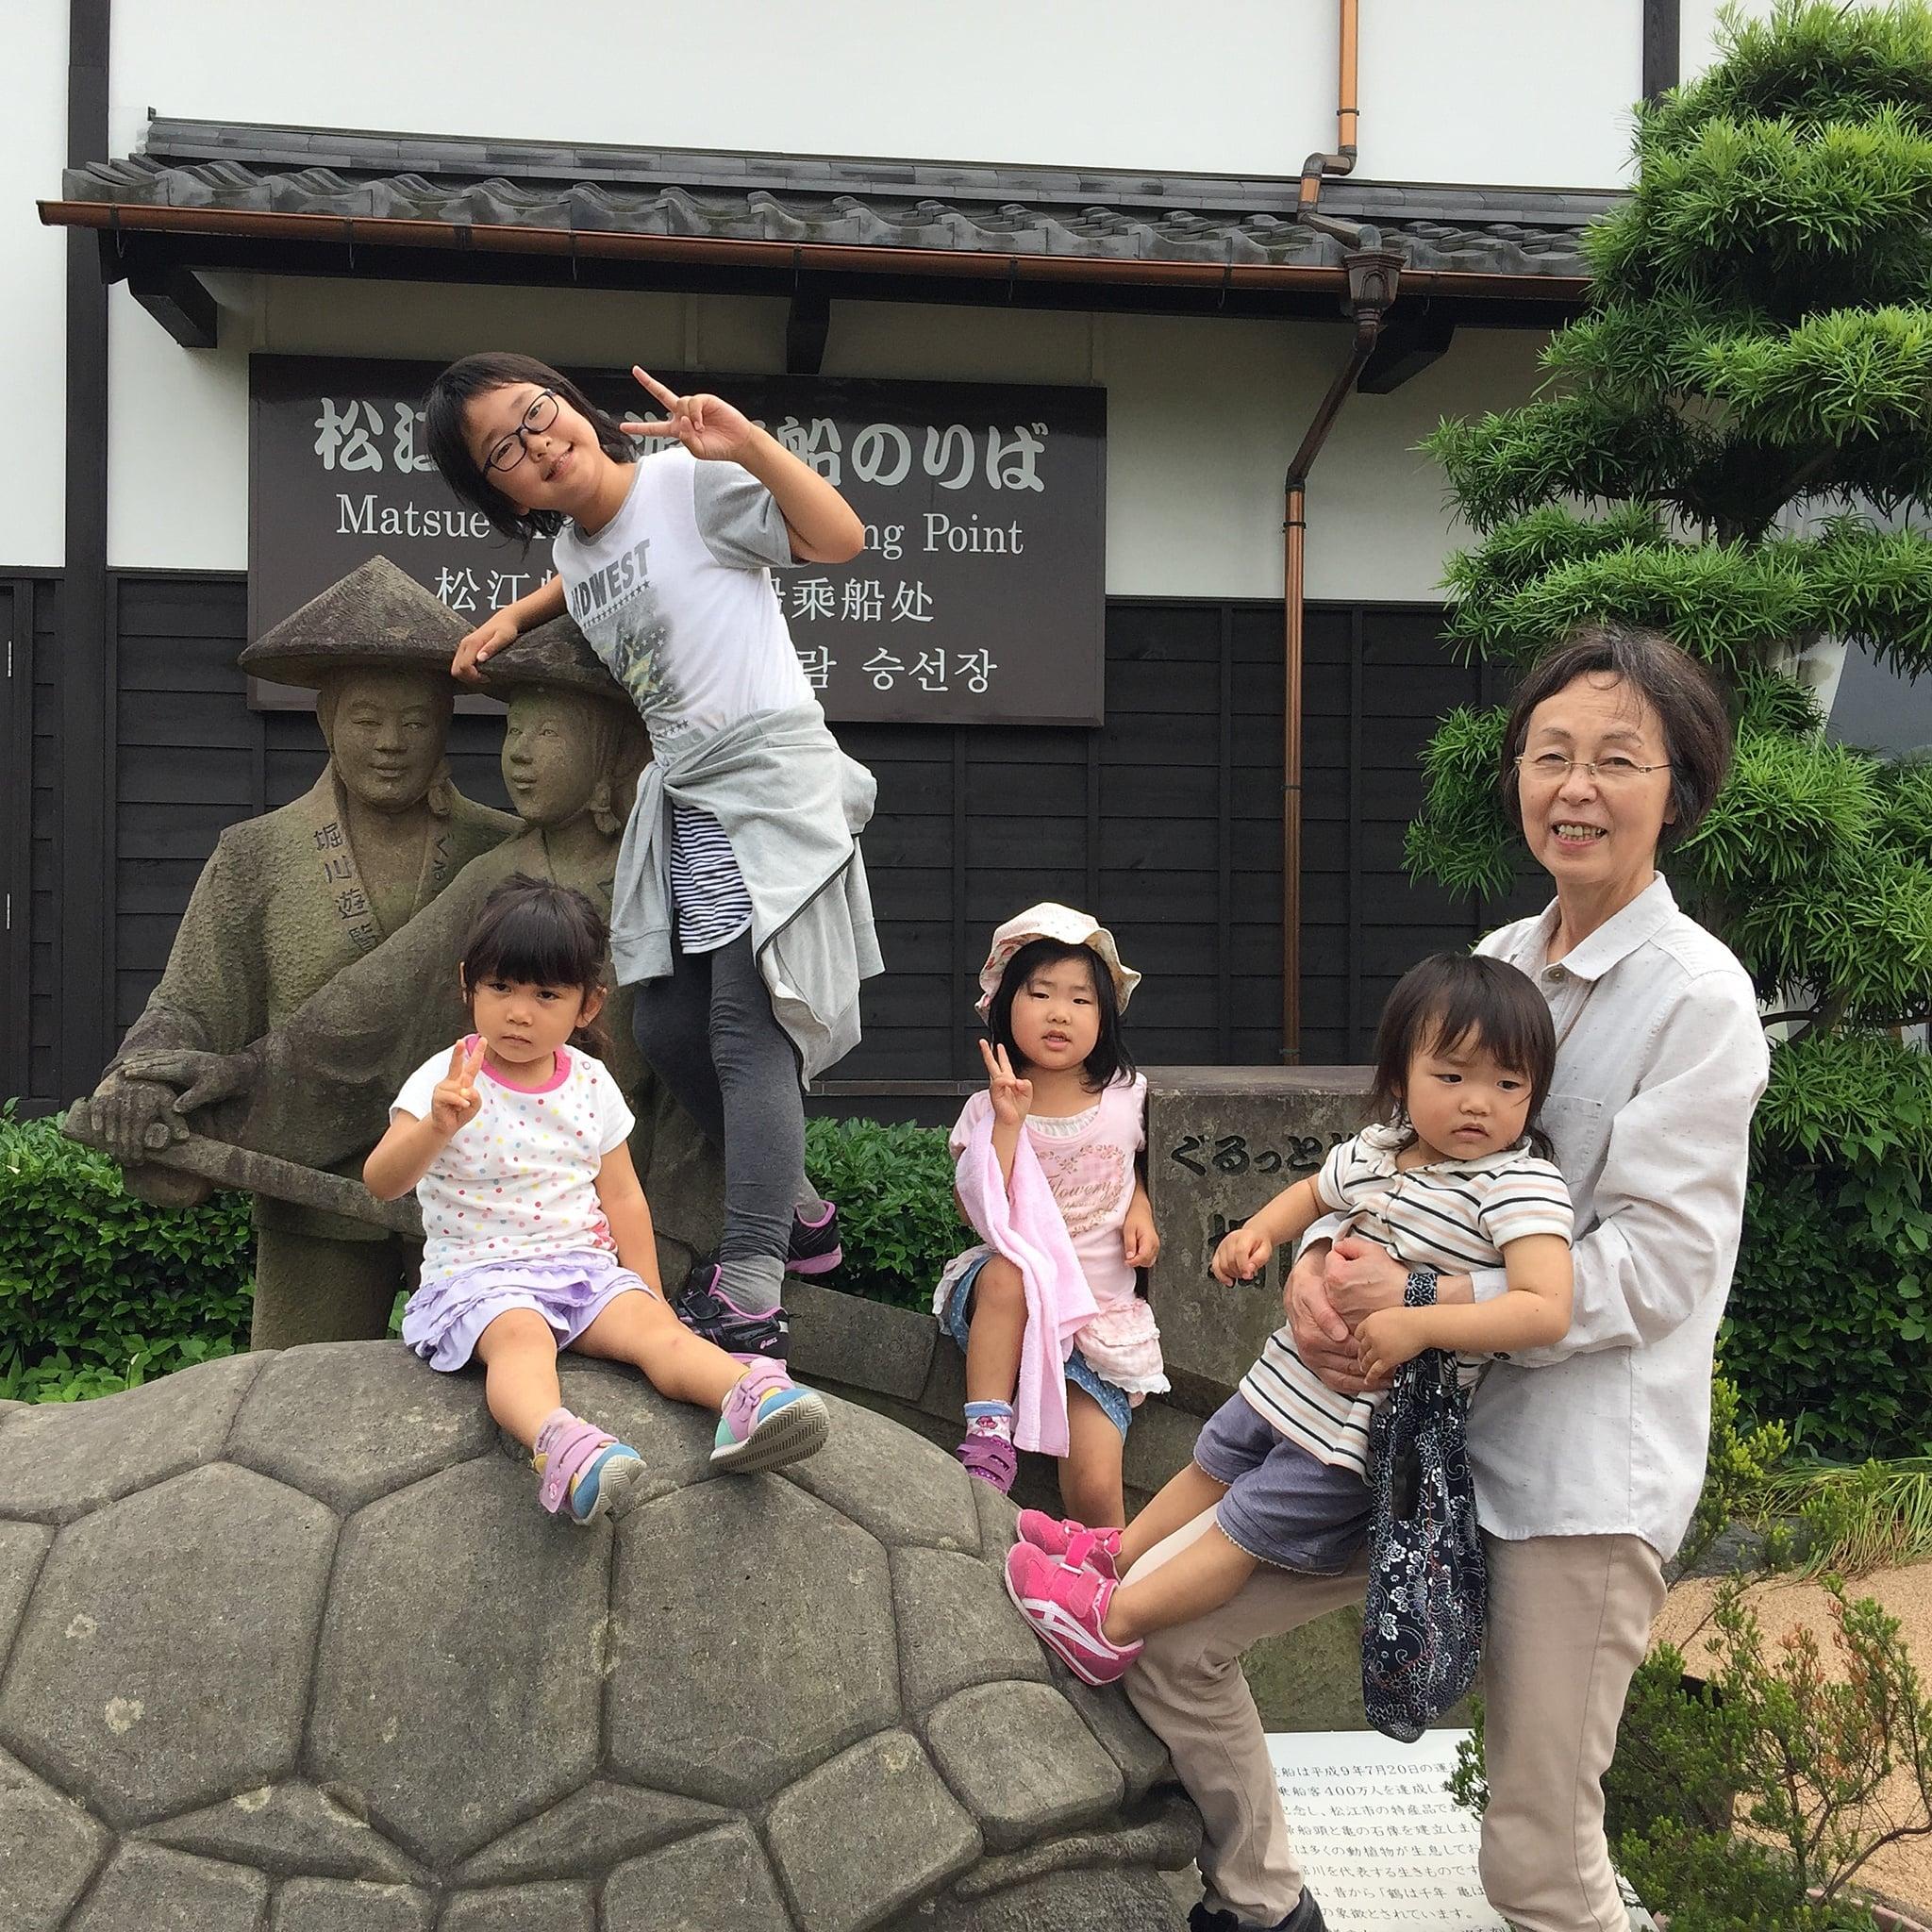 https://ogura-sekkei.jp/files/libs/48/201606151136446858.JPG